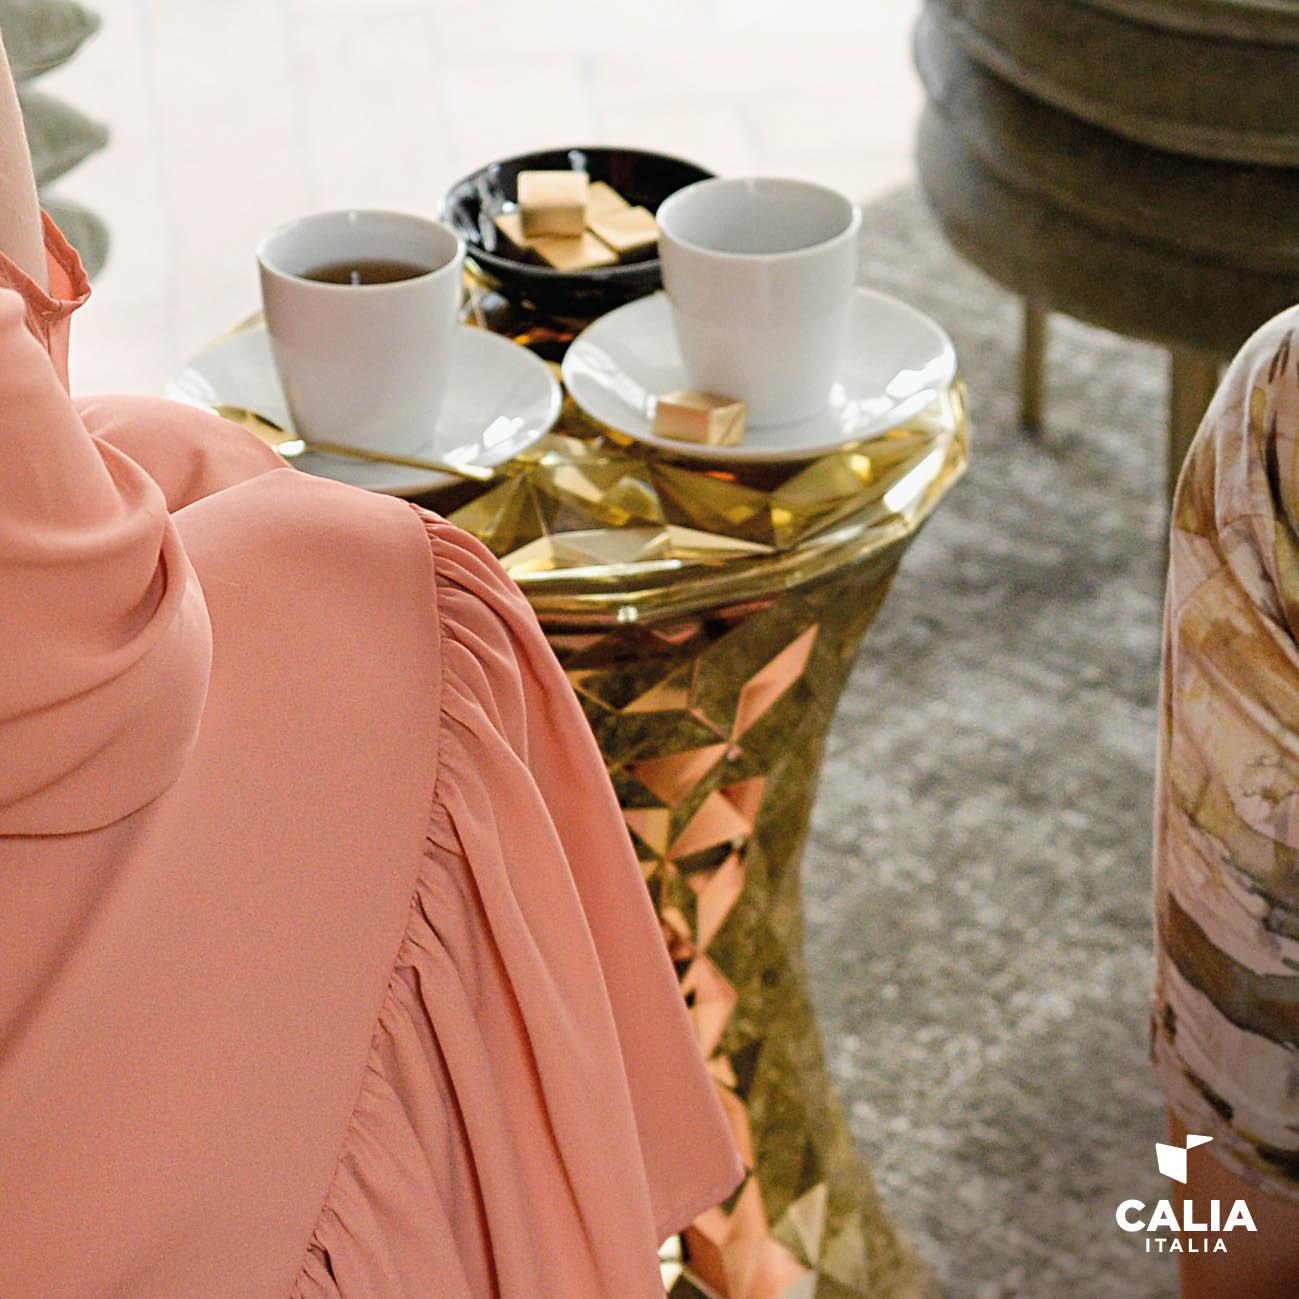 Caliaitalia - Mater Familias Pouf e Bench